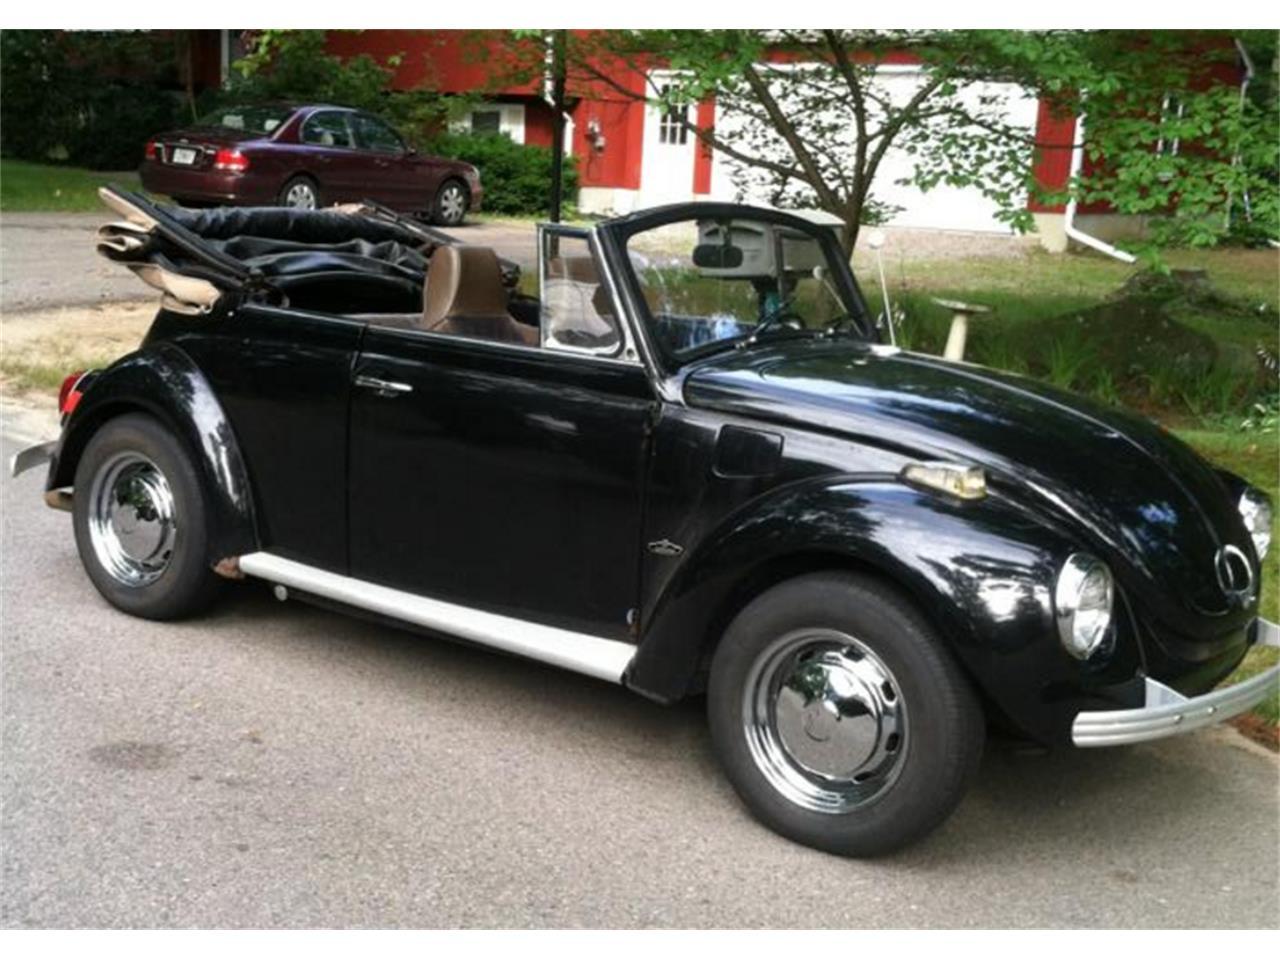 1971 Volkswagen Super Beetle For Sale Classiccars Com Cc 1005509